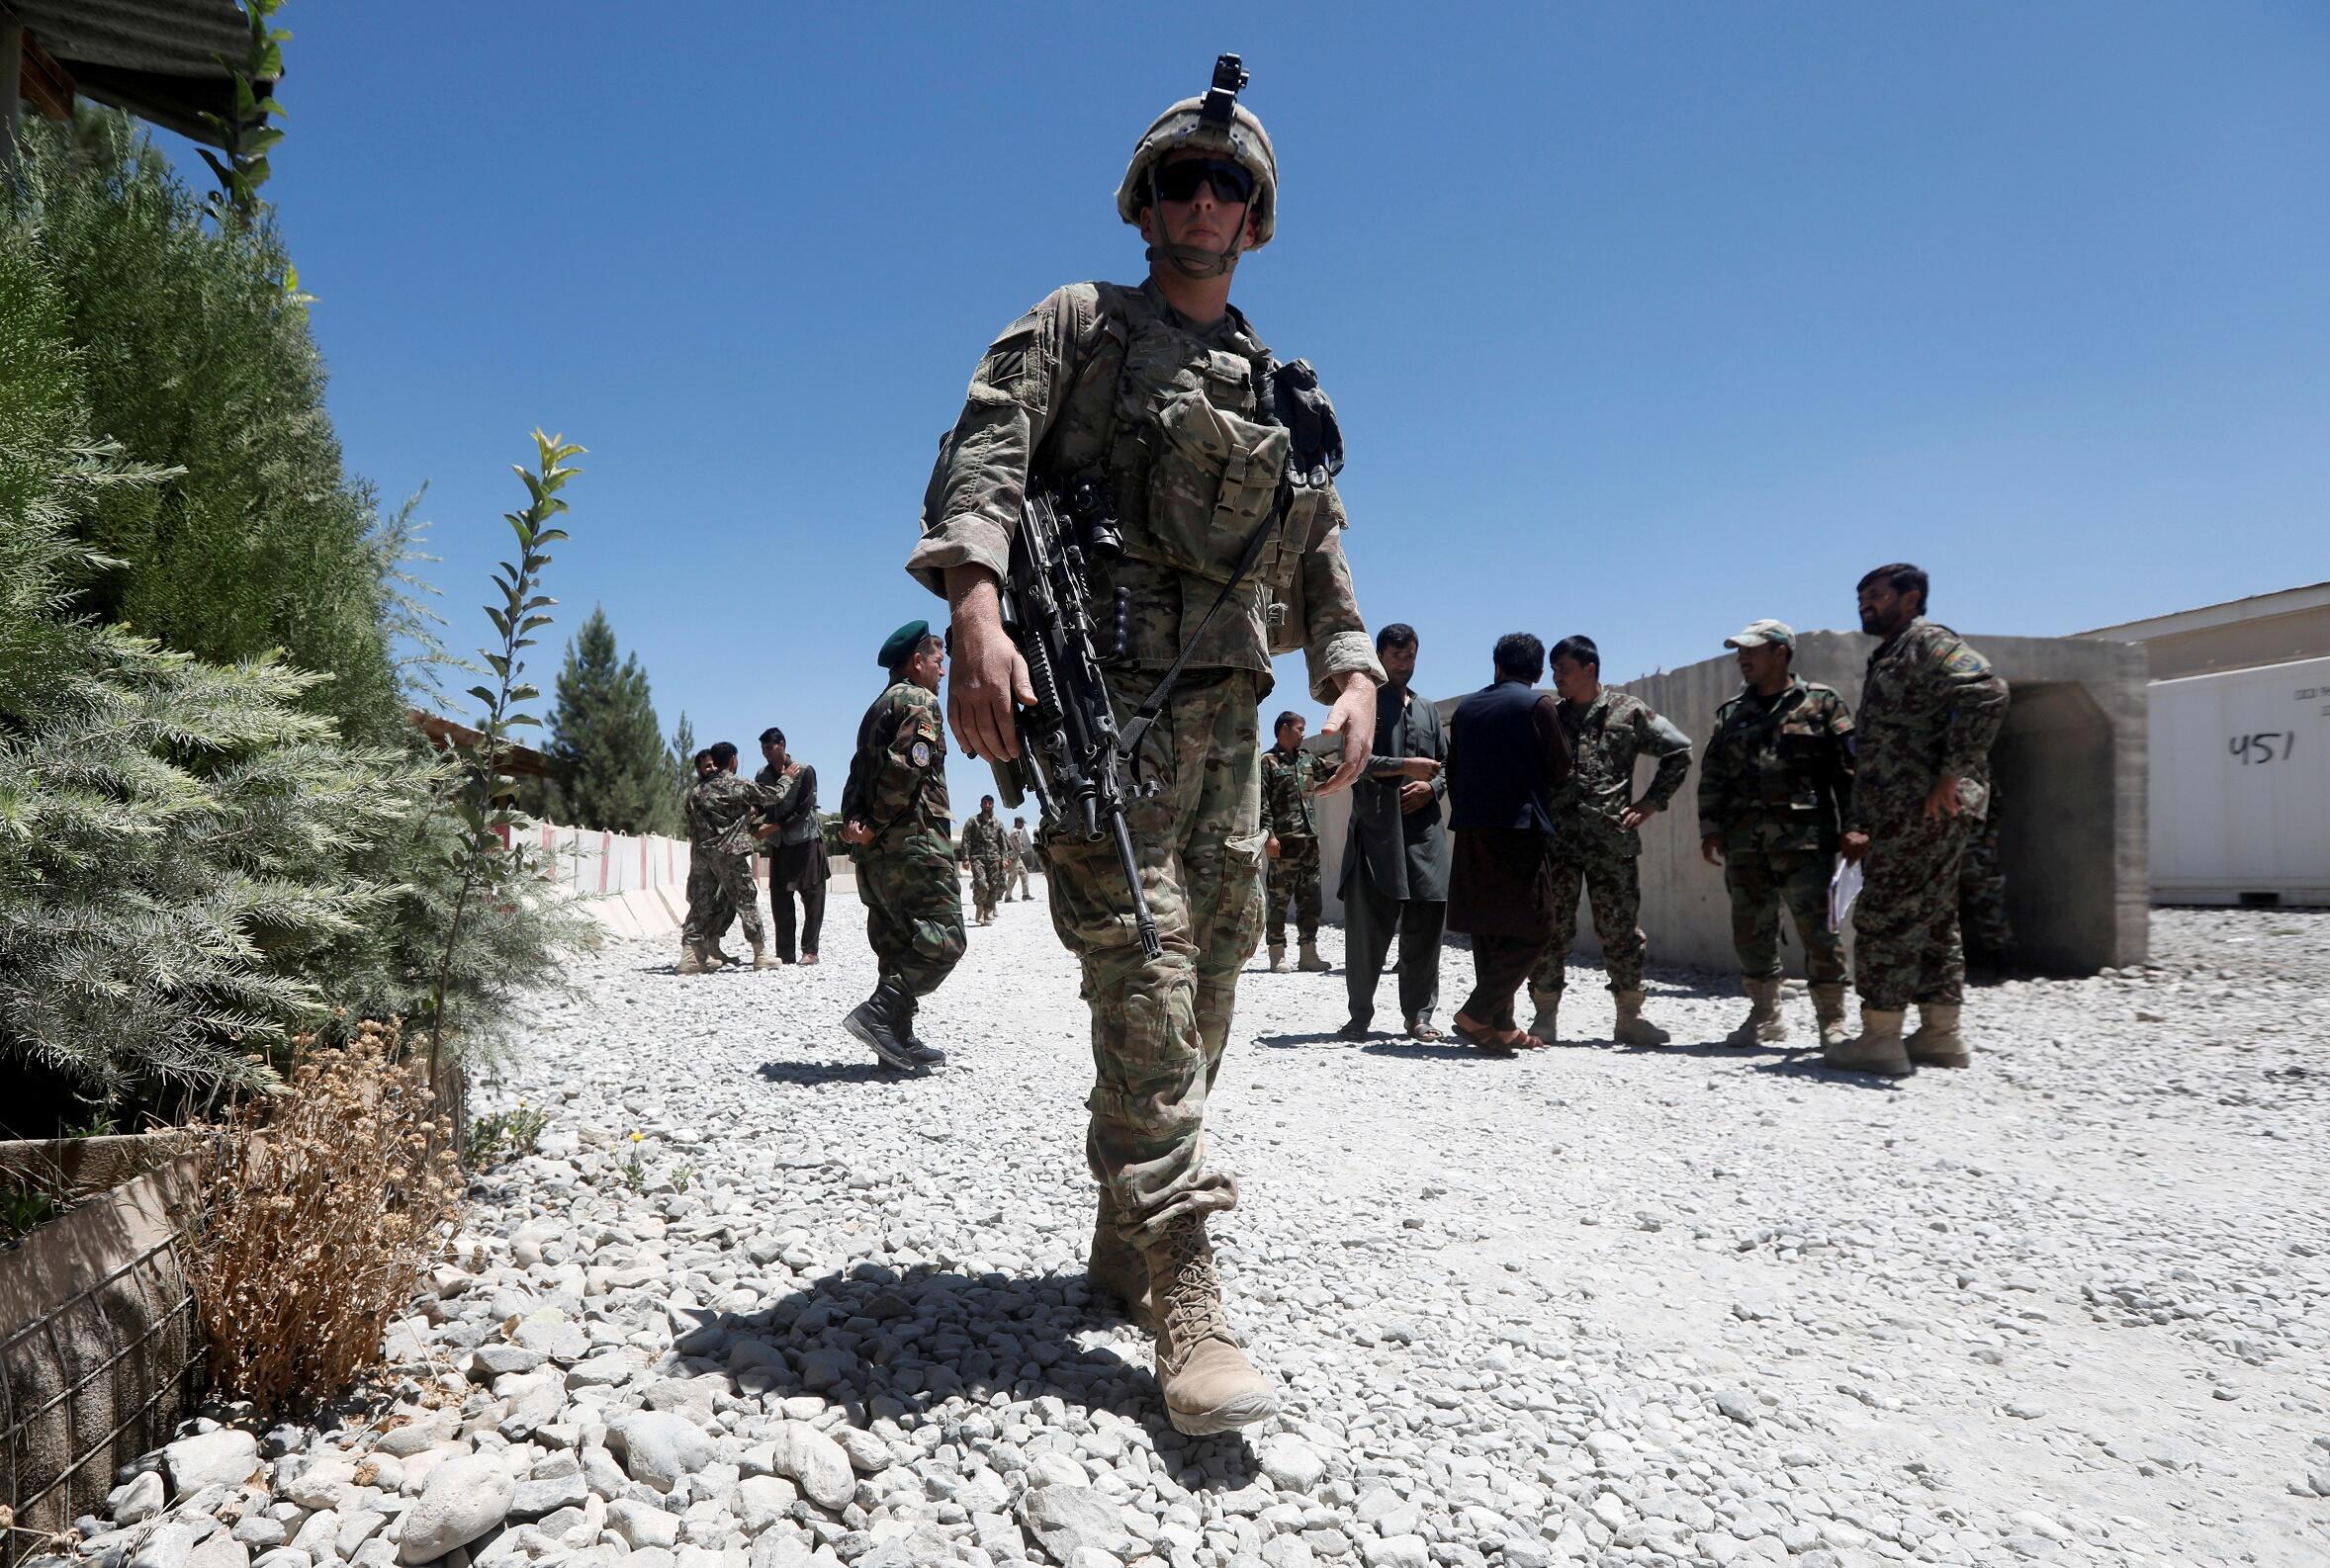 Soldat américain Afghanistan Otan